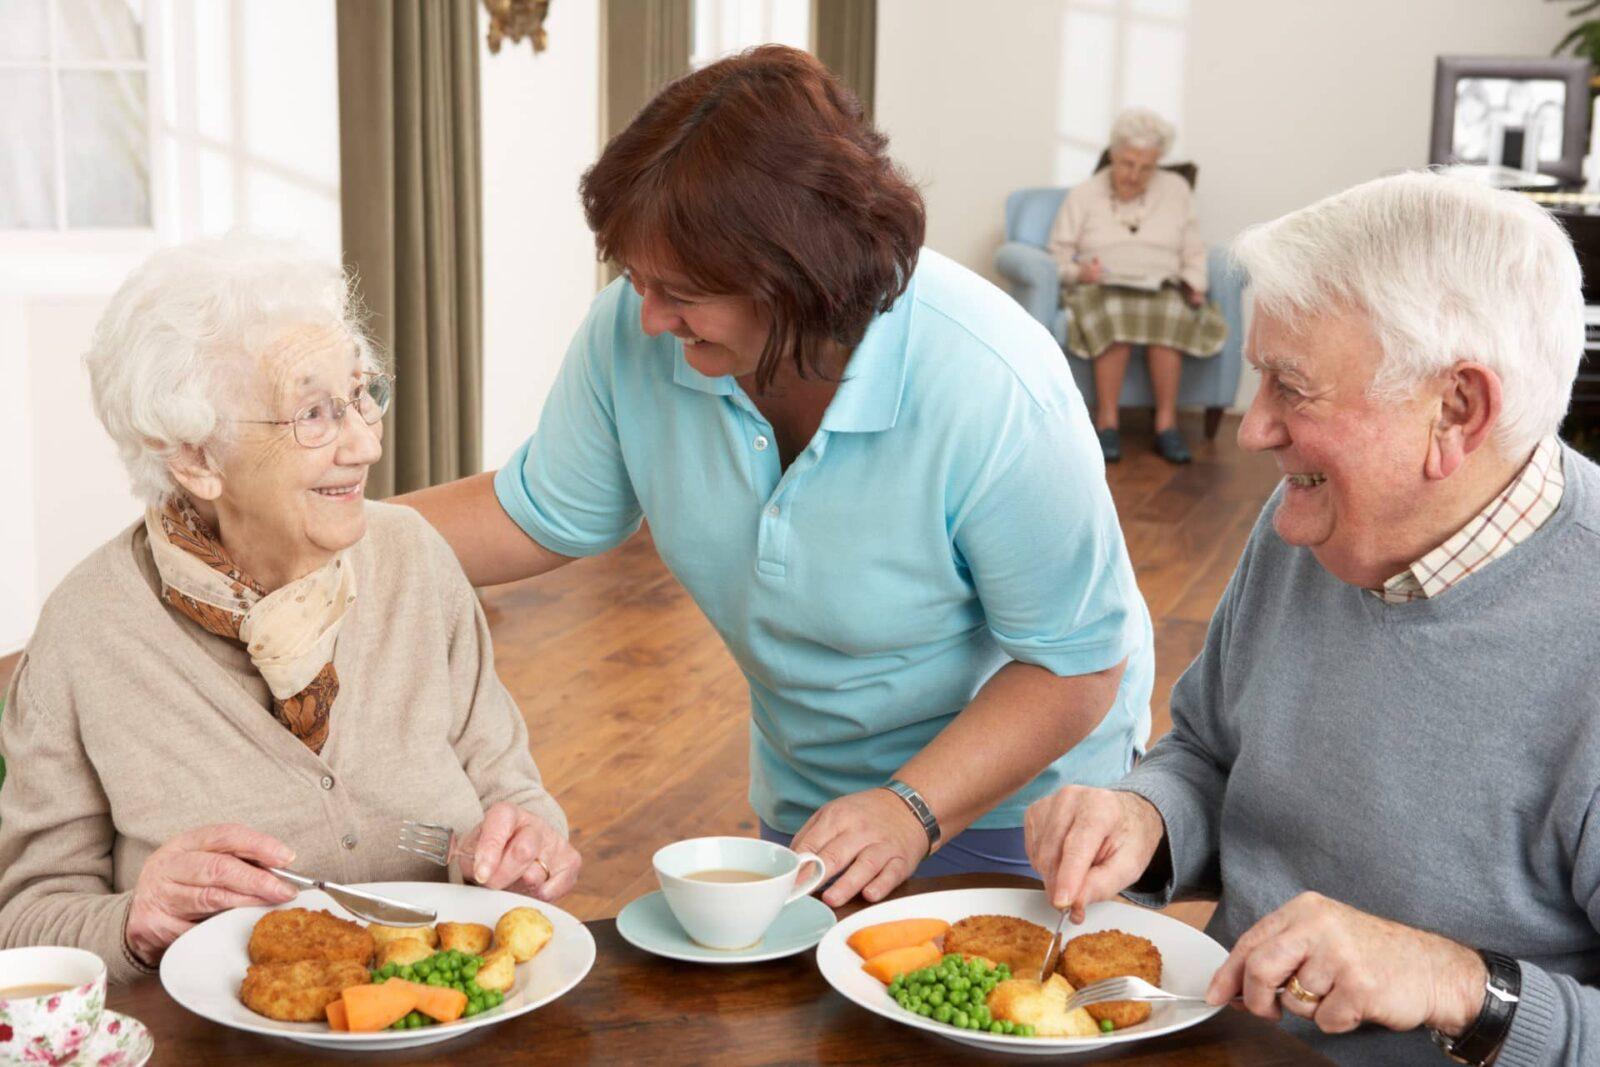 Spouse needs nursing home care